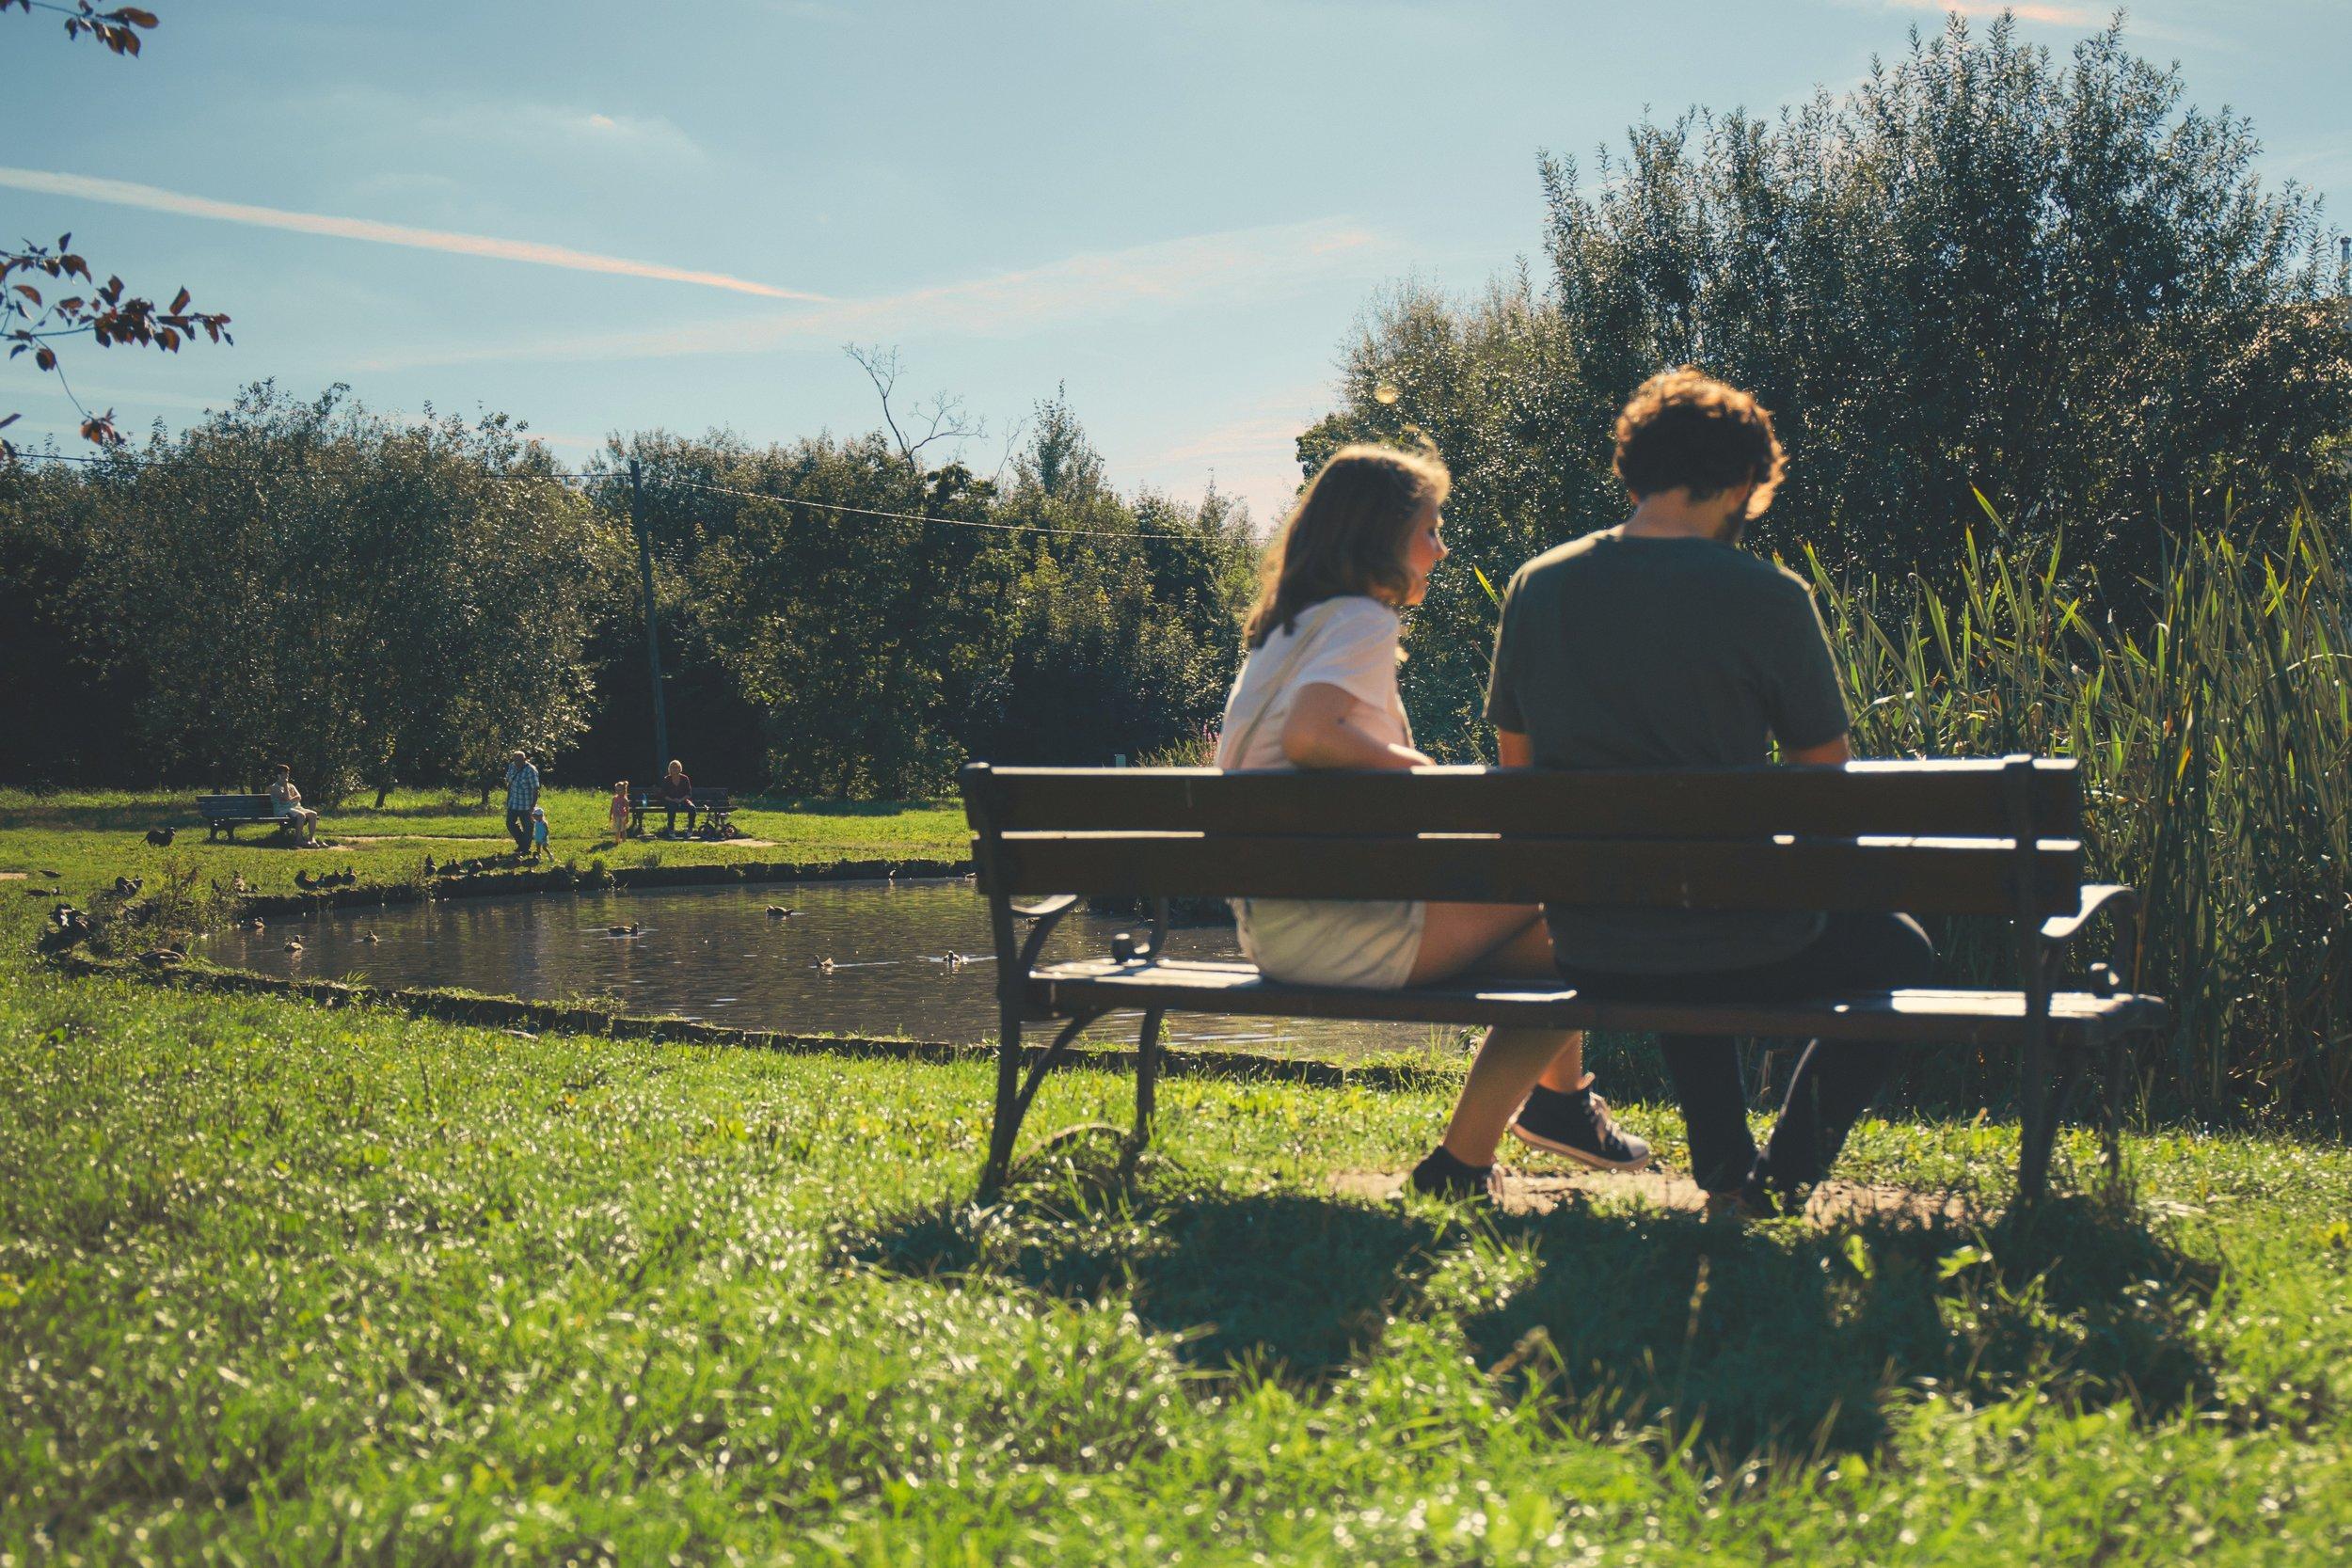 bench-couple-daylight-172368.jpg